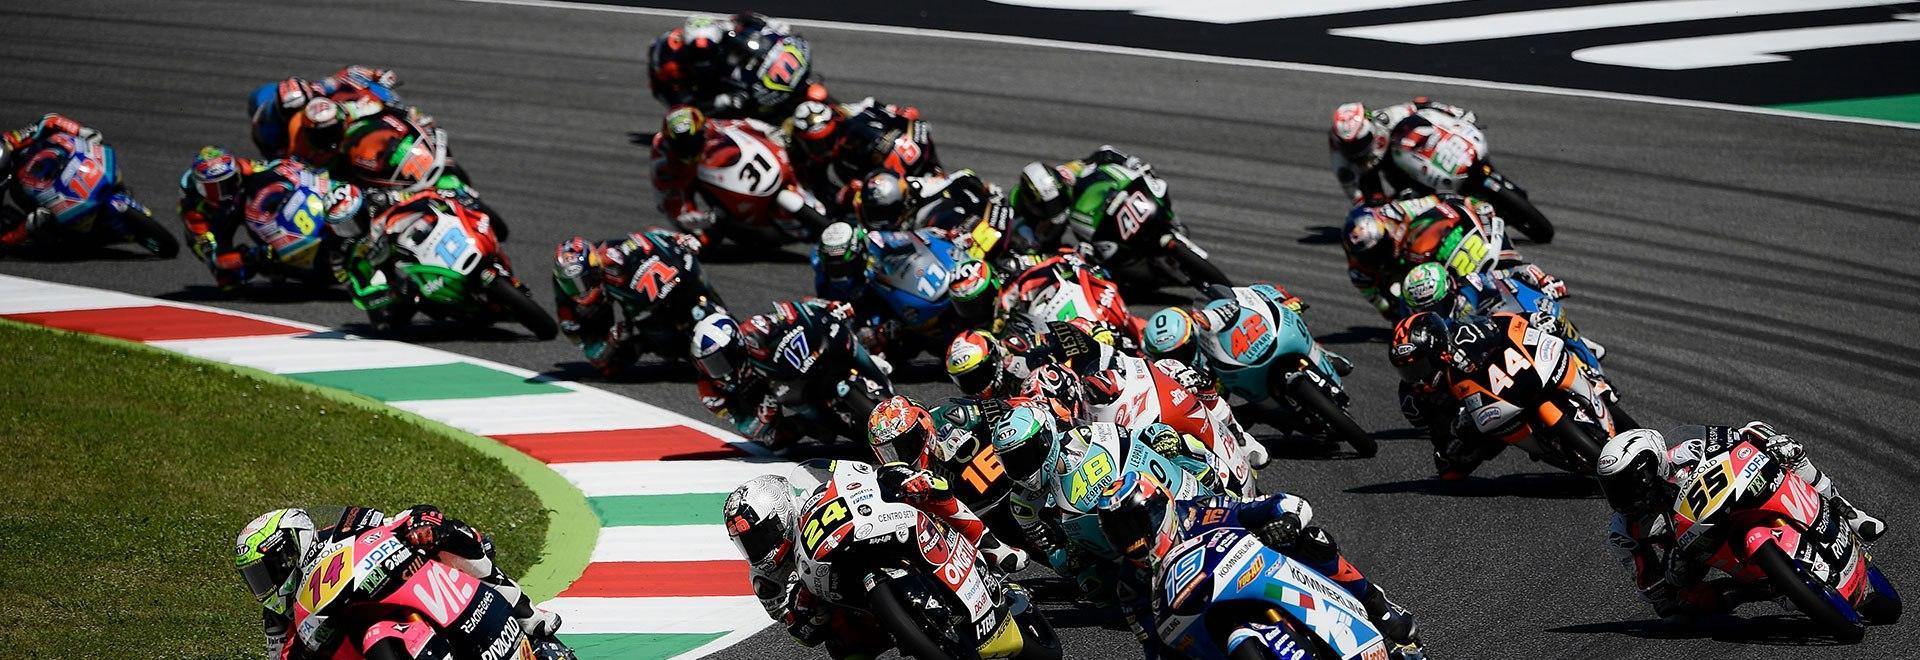 Supersport Misano. Race 1